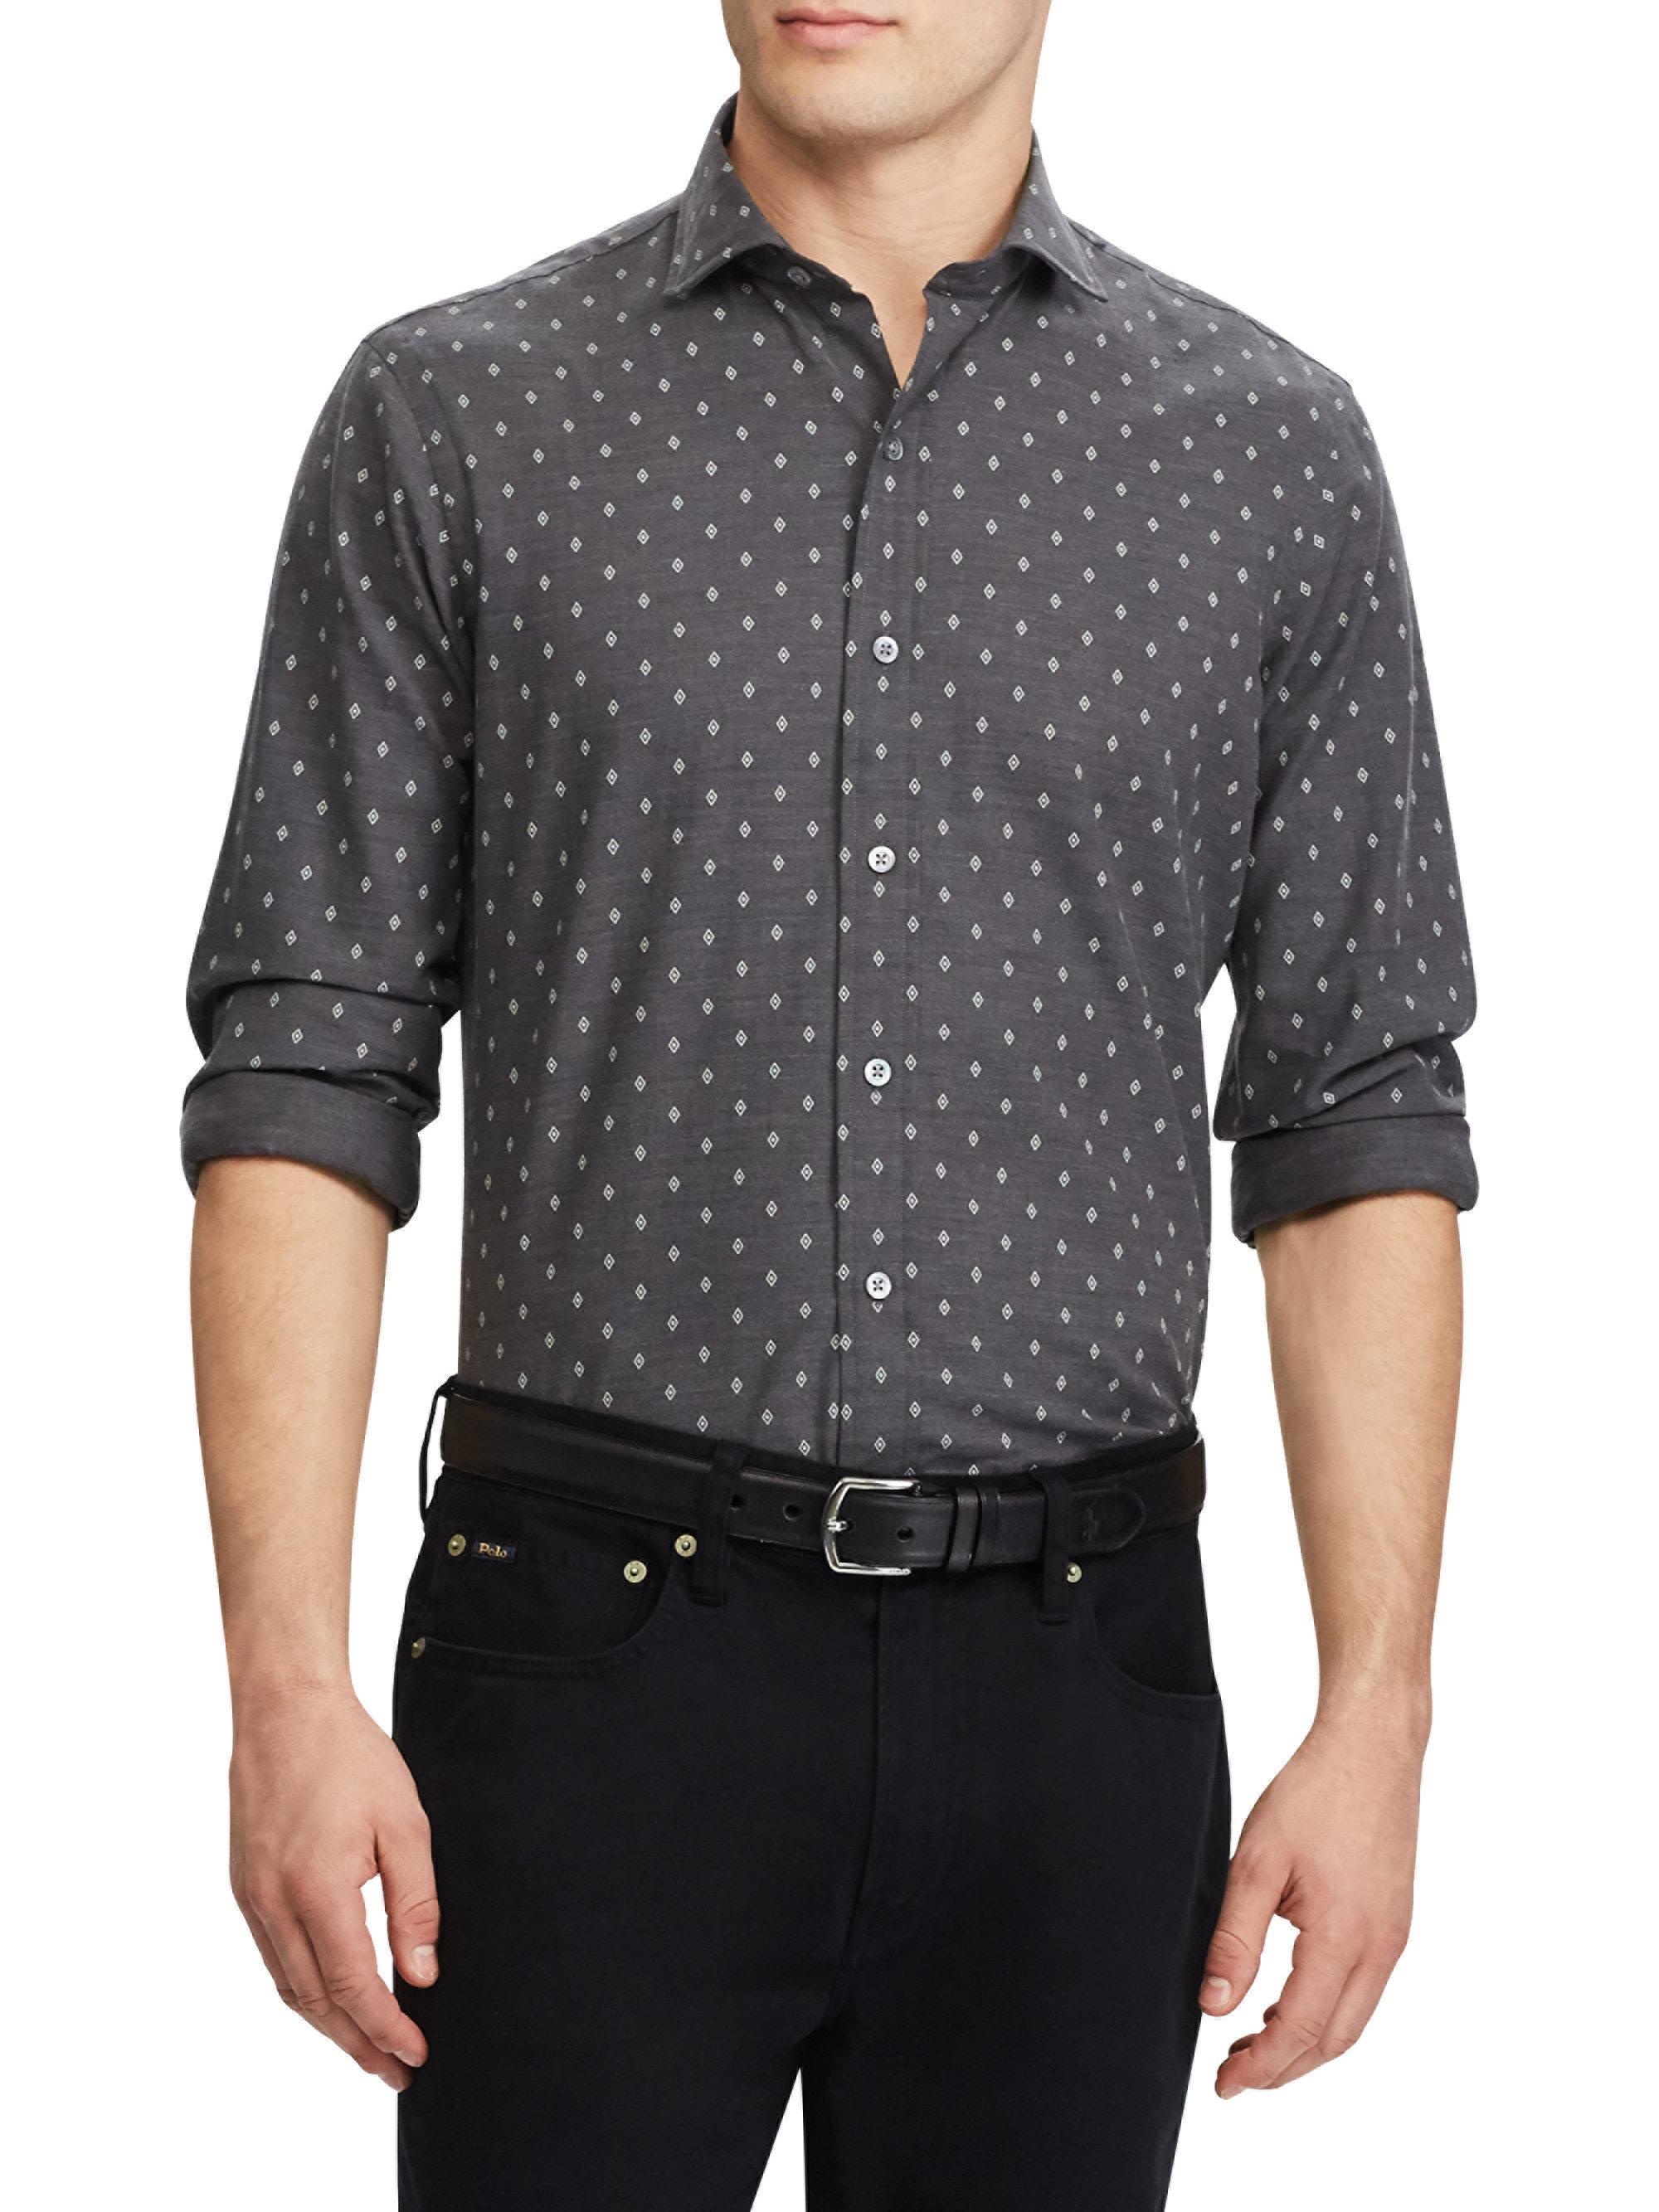 Polo ralph lauren herringbone casual button down shirt in for Polo ralph lauren casual button down shirts